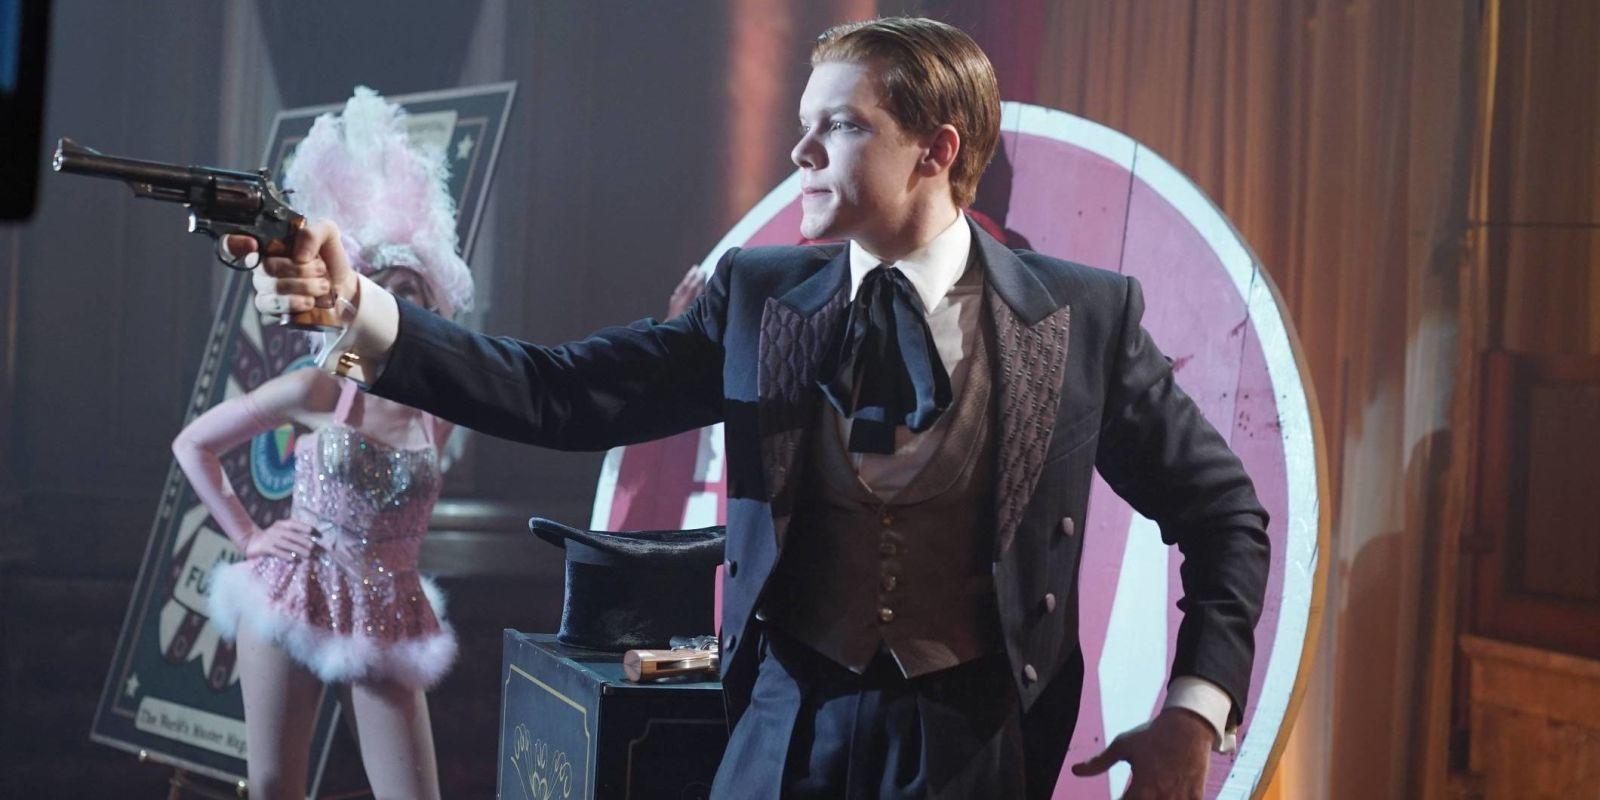 Cameron Monaghan as Jerome Valeska in Gotham season 2